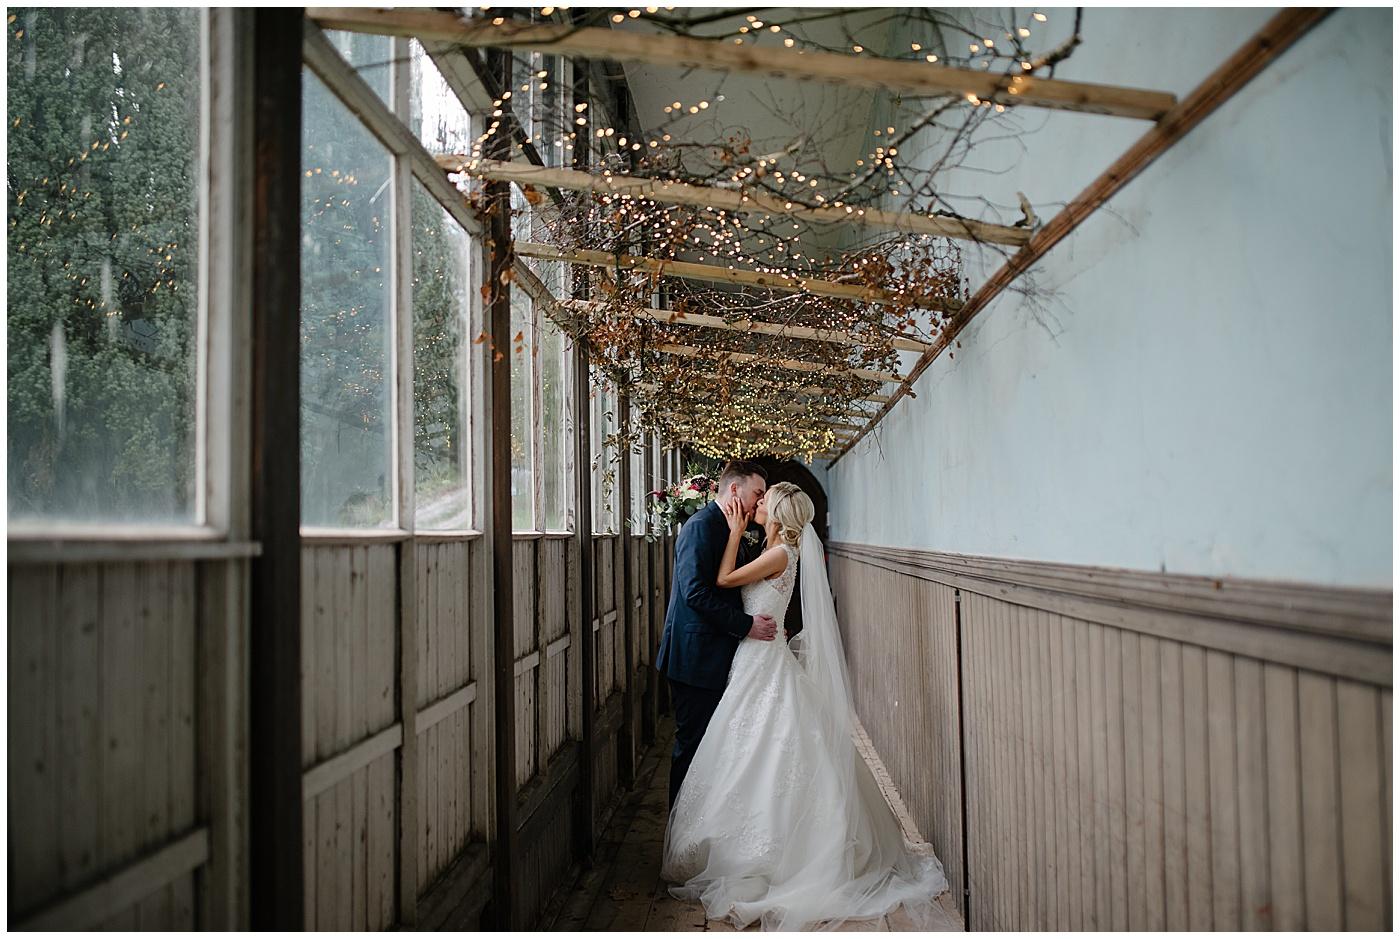 lissan-house-wedding-jude-browne-photography_0078.jpg